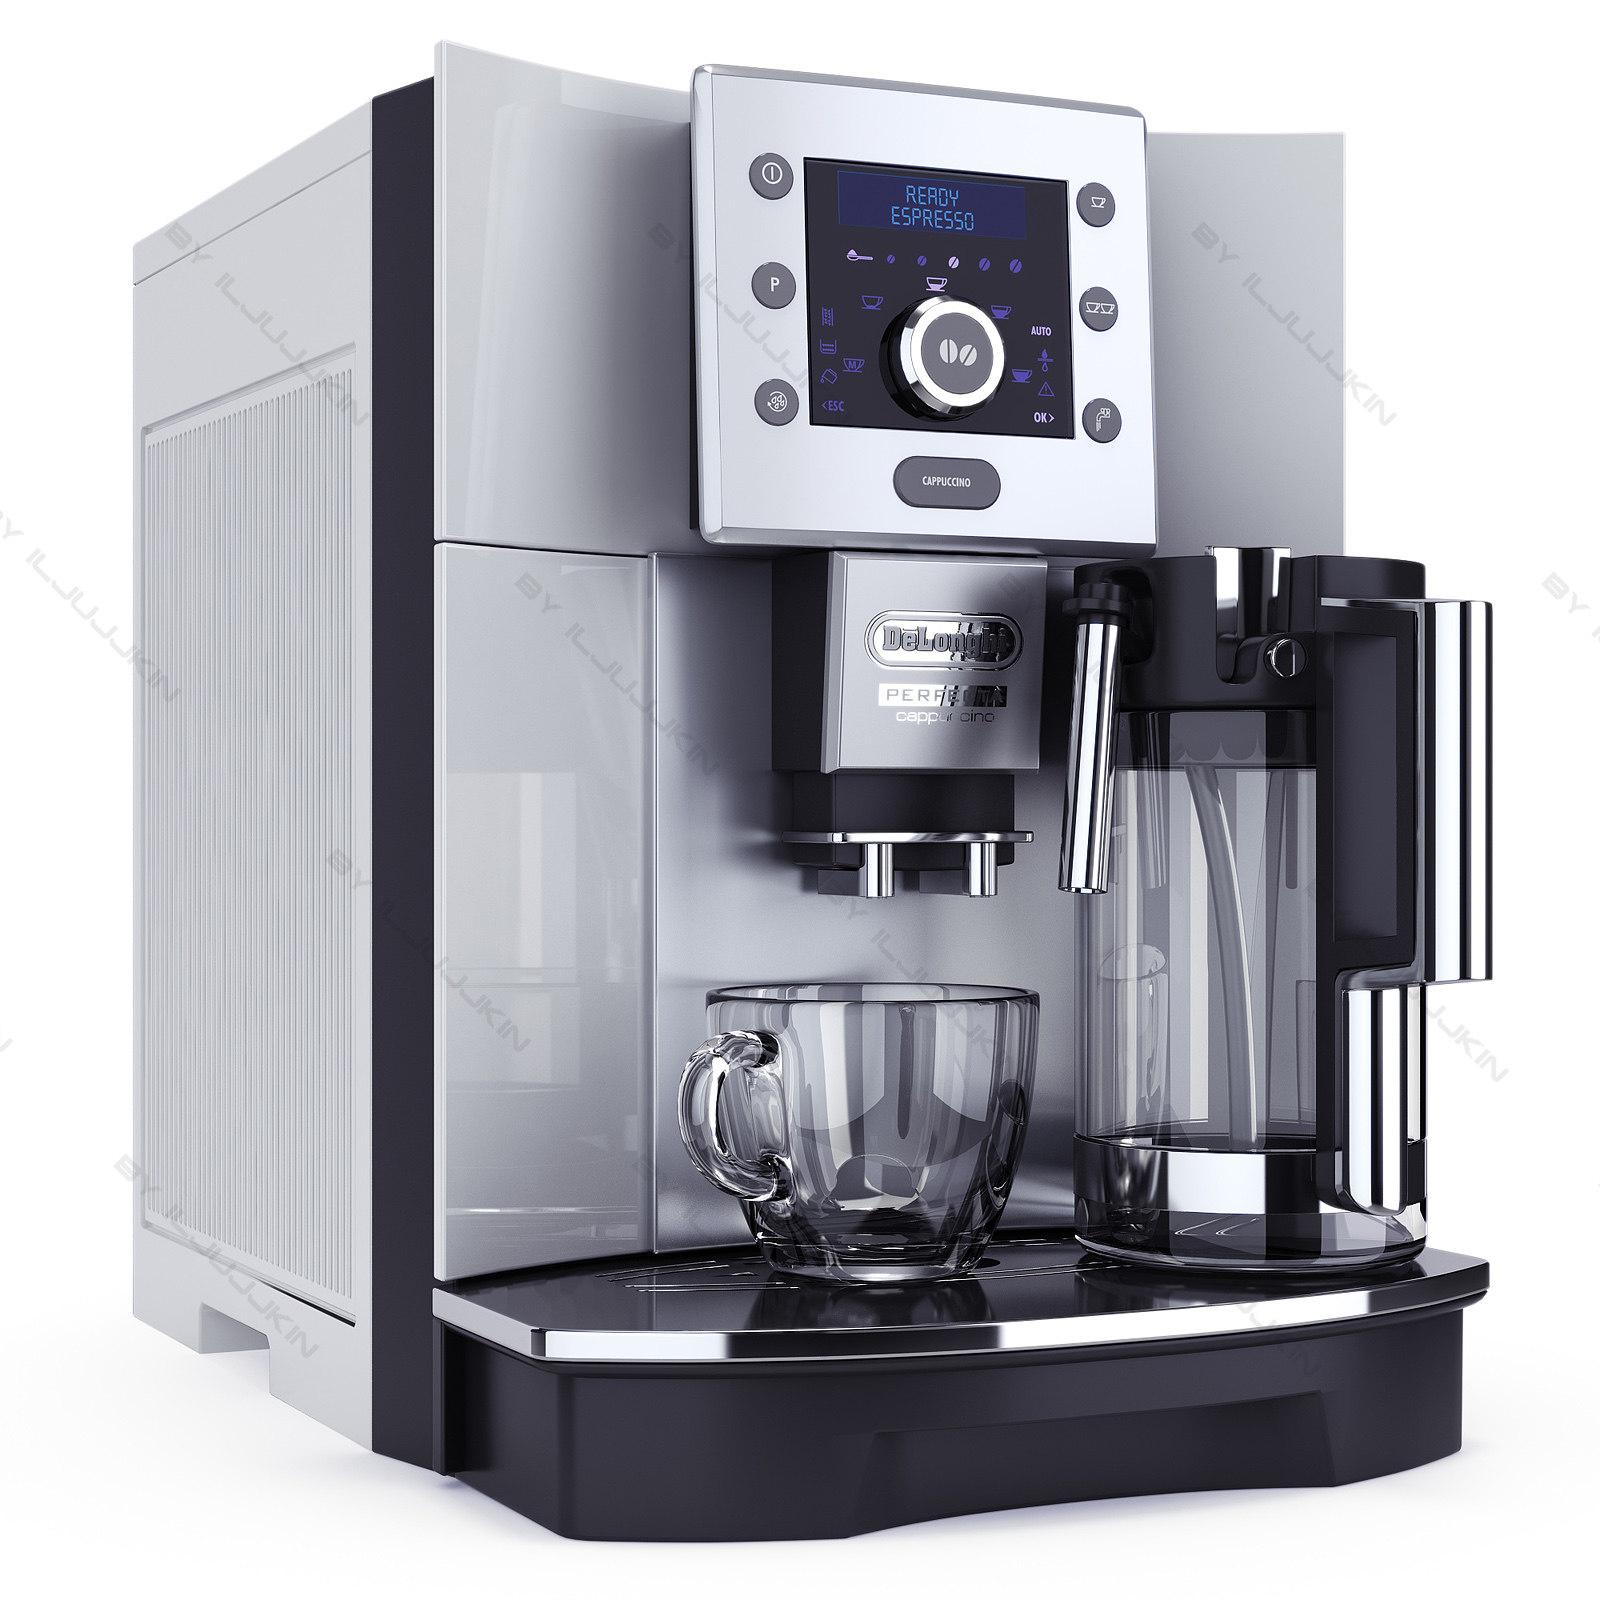 Coffee maker 3d model - Machine cafe delonghi ...